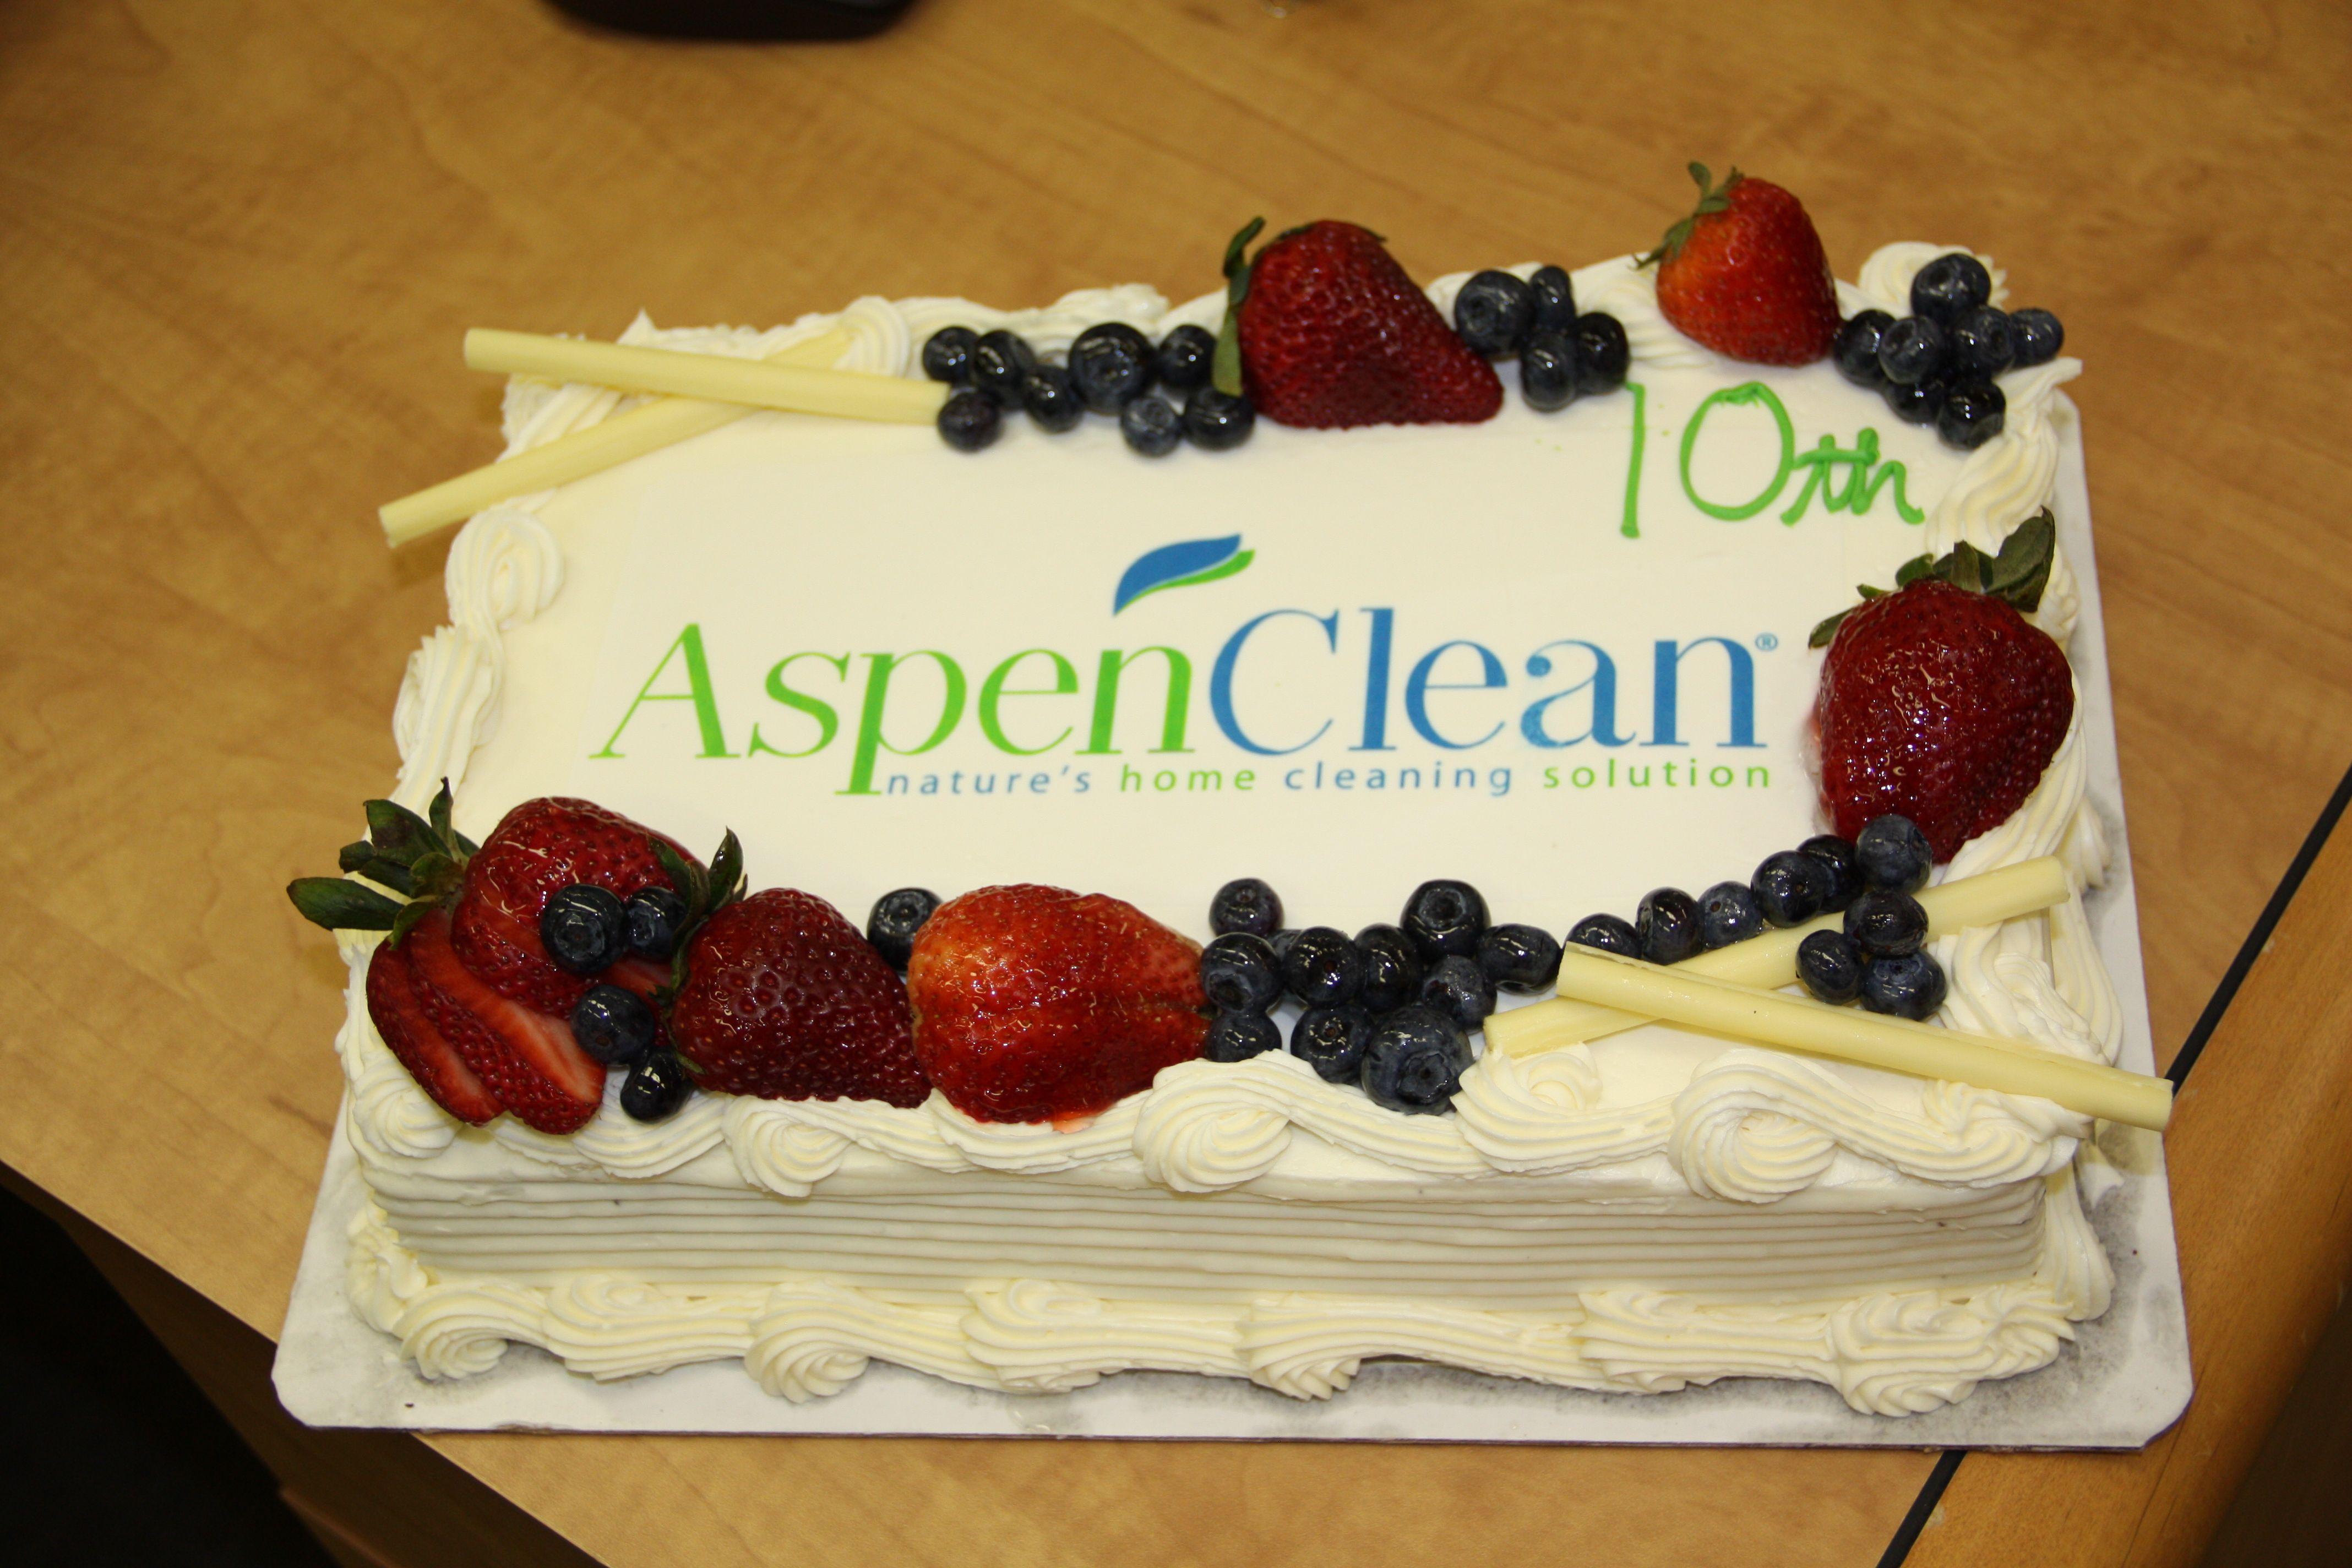 10 year anniversary celebration aspenclean clean house